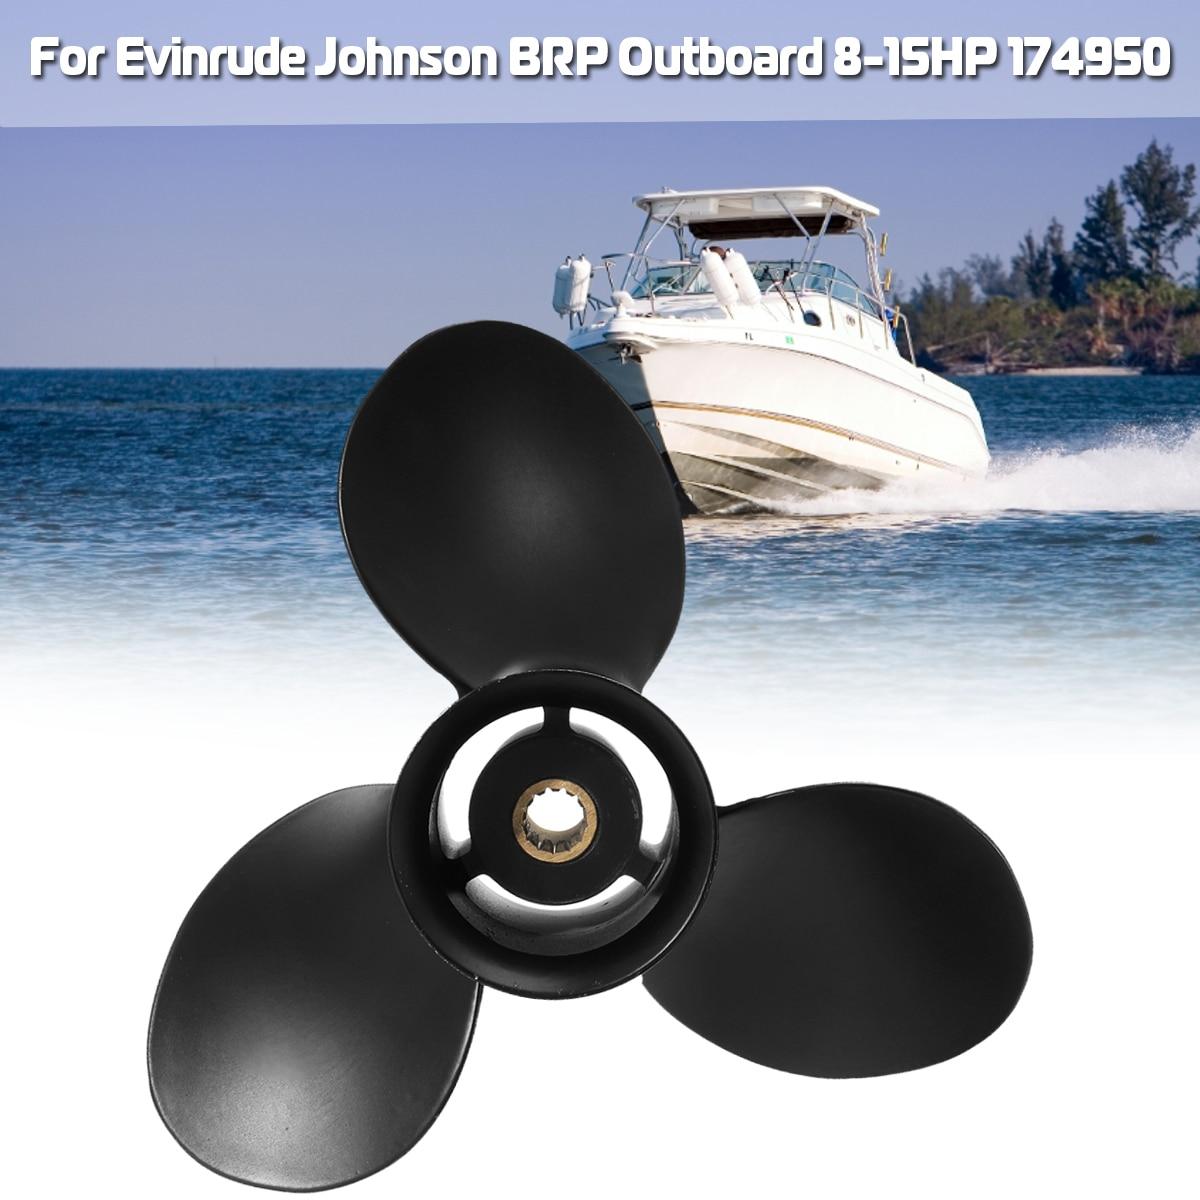 medium resolution of 174950 778772 for evinrude johnson brp 8 15hp 9 1 4 x 10